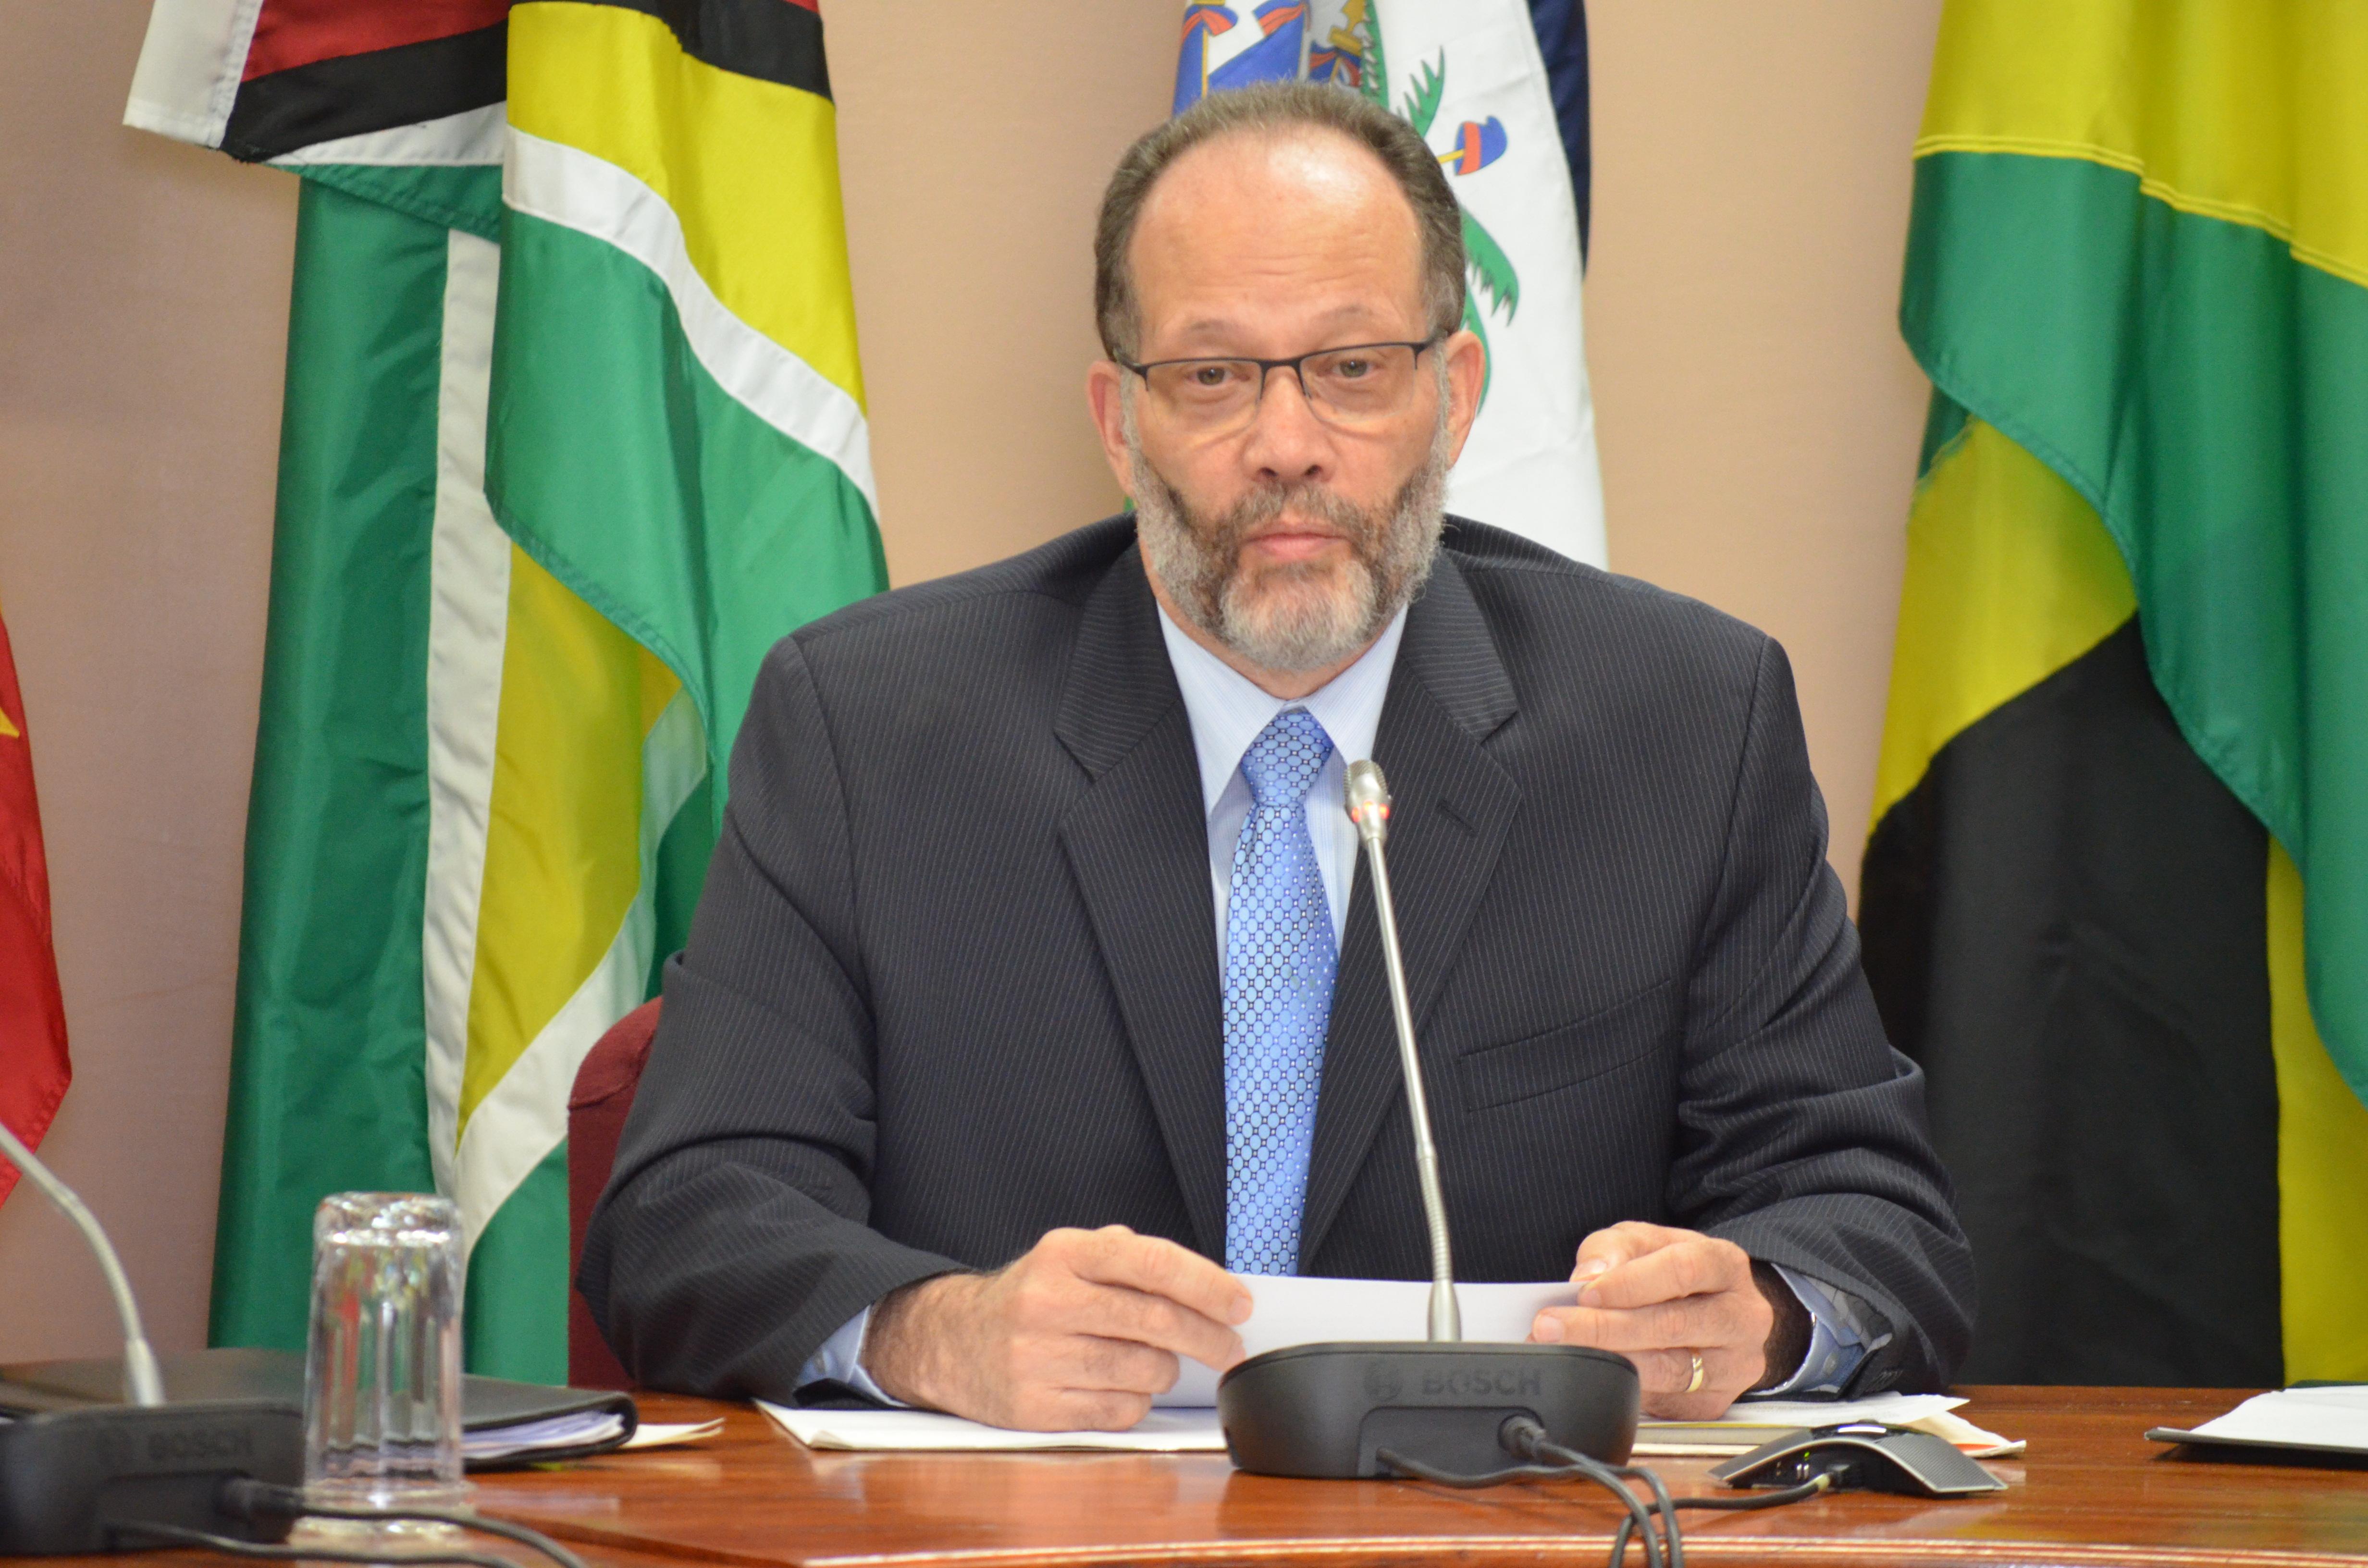 CARICOM Secretary General, Ambassador Irwin LaRocque